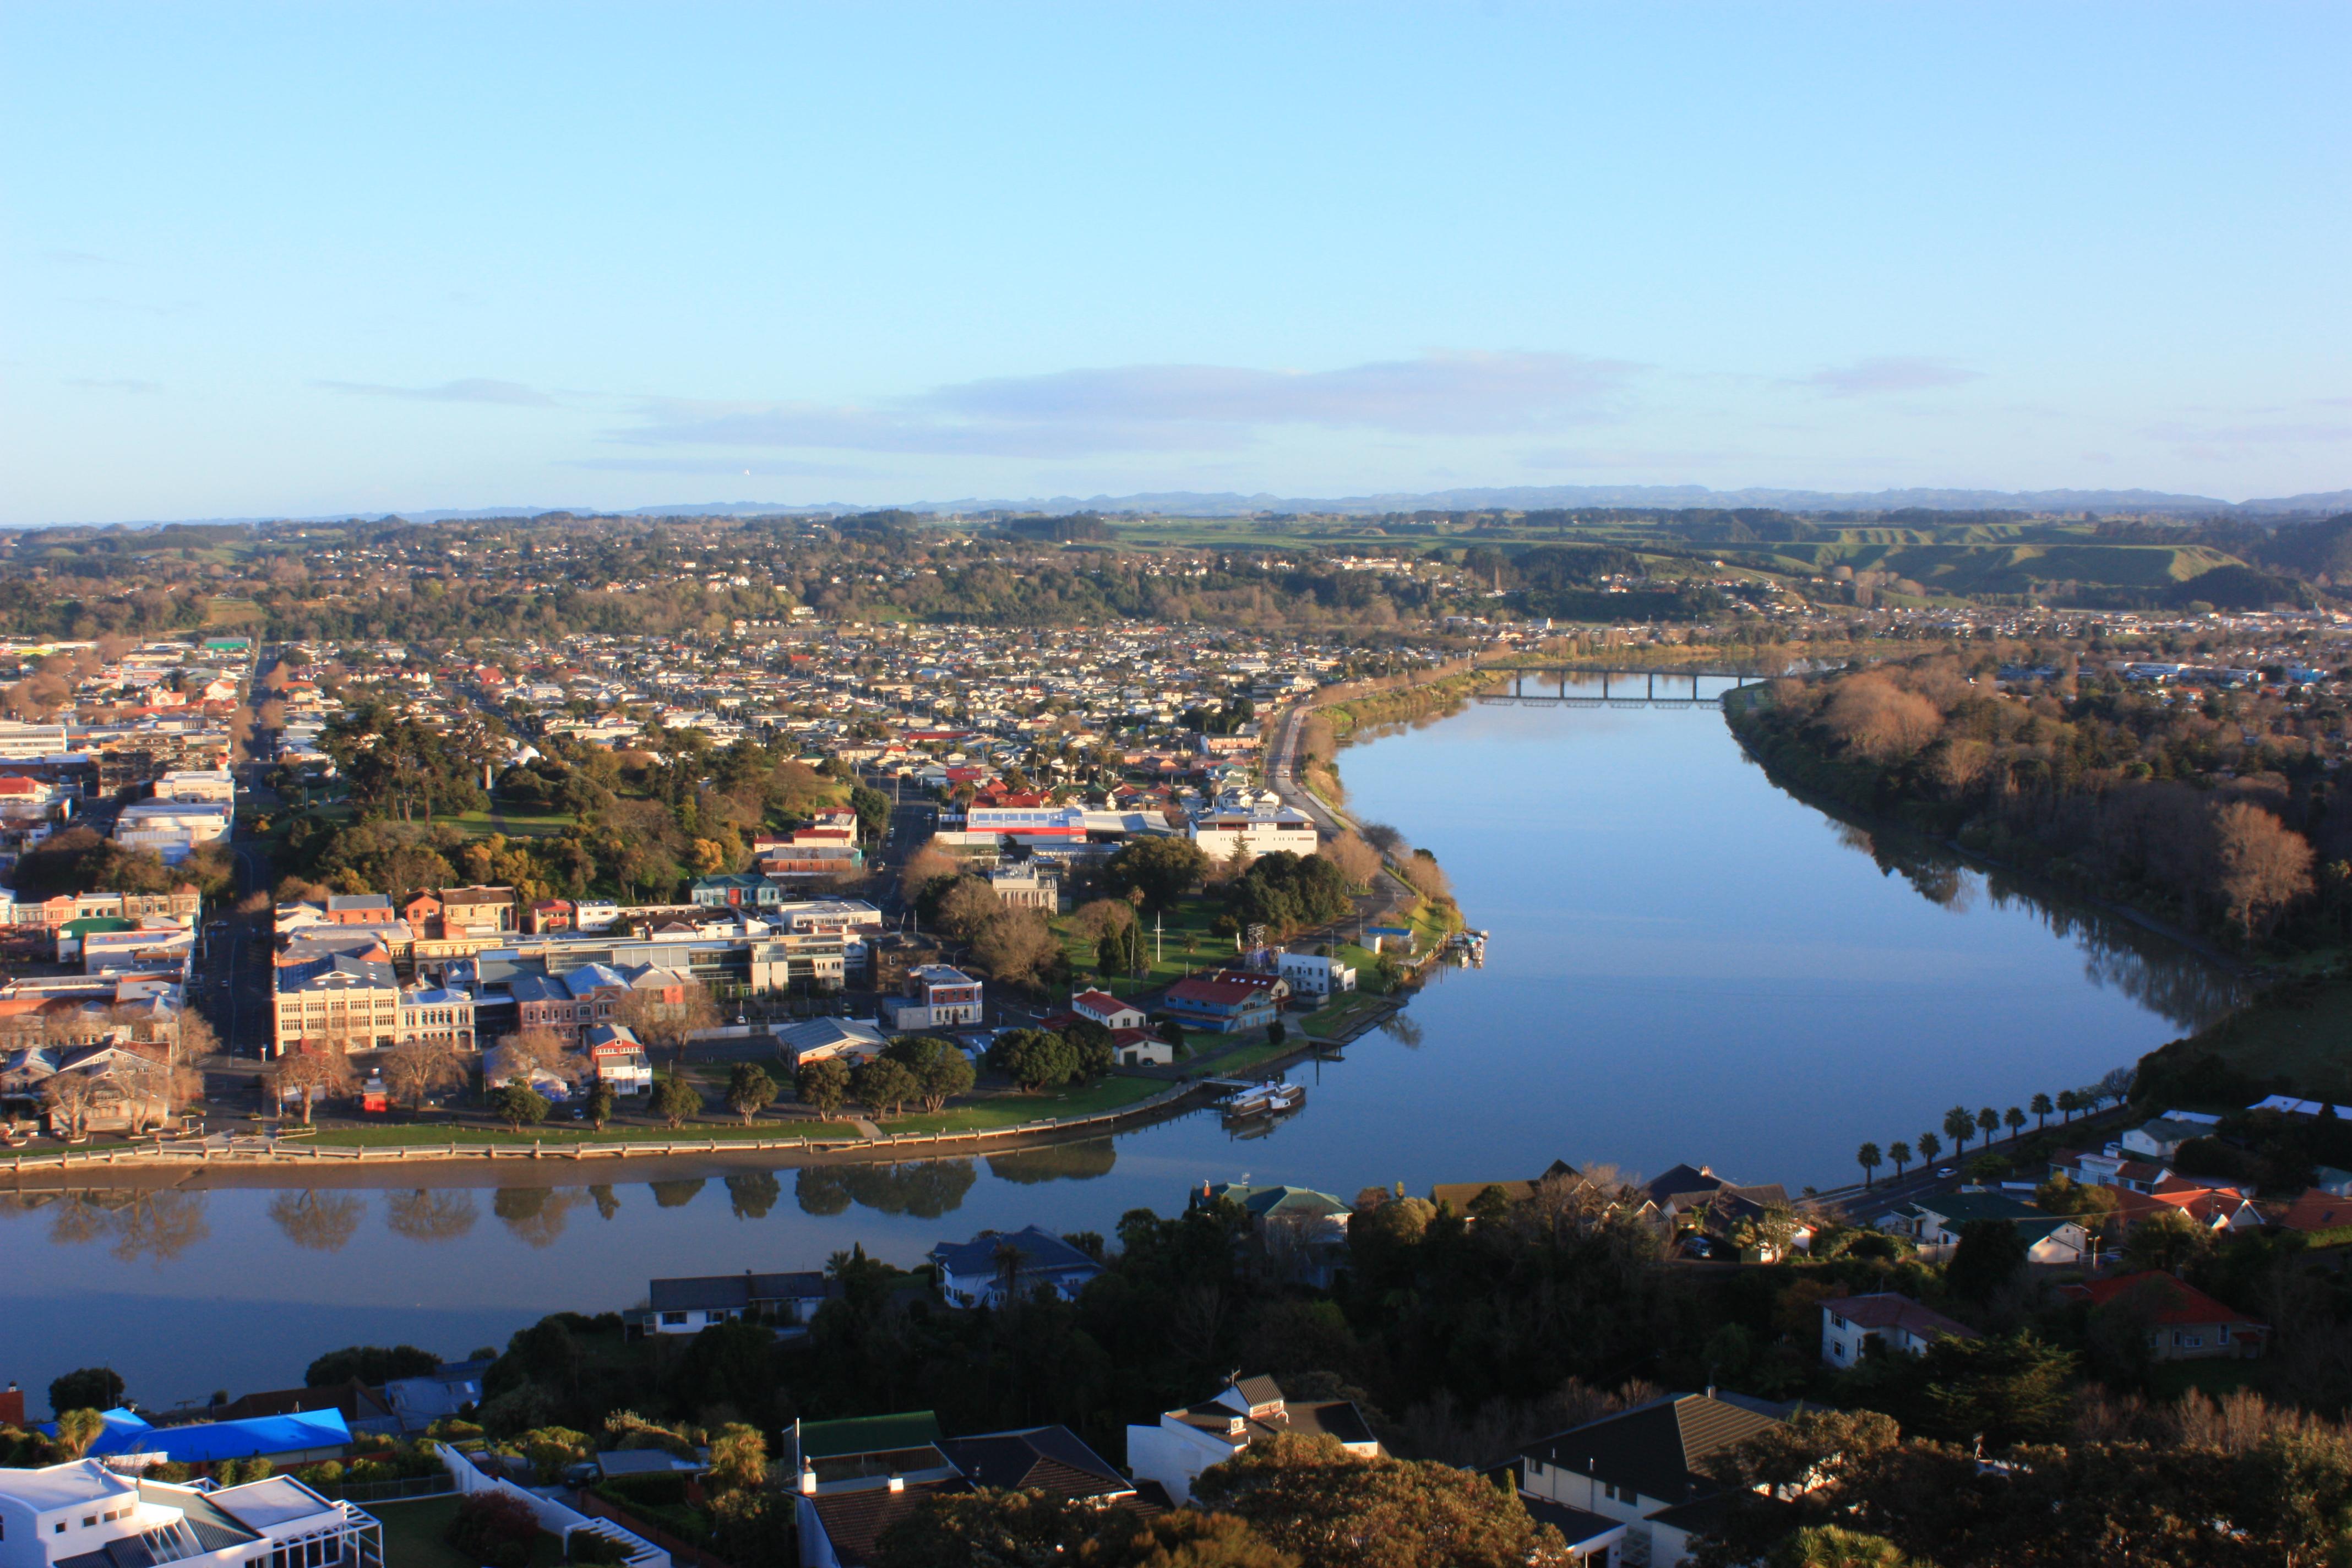 Wanganui New Zealand  city pictures gallery : Whanganui River to Dublin Street Bridge Wikimedia Commons